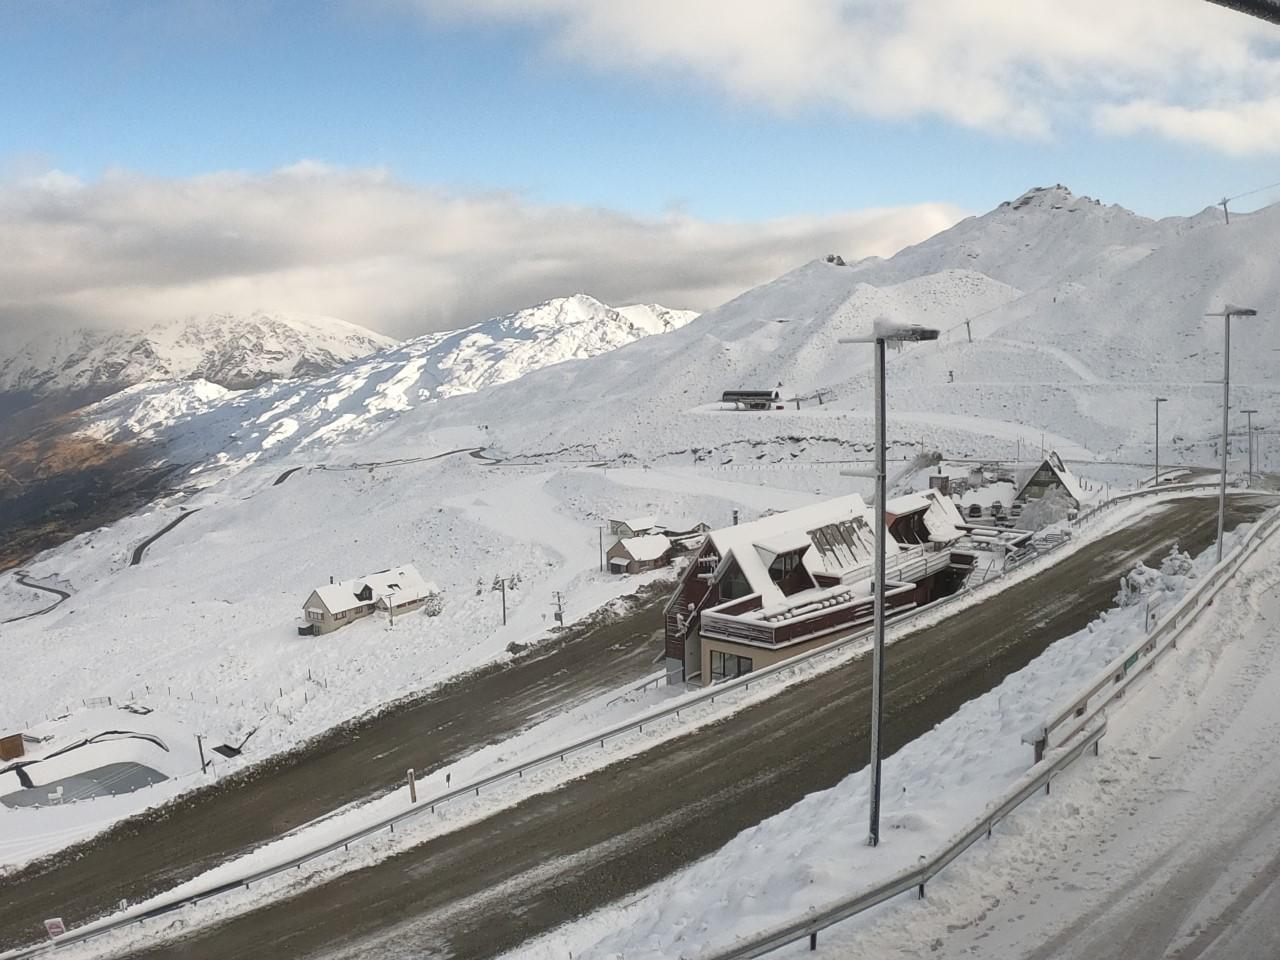 winter has arrived, Coronet Peak